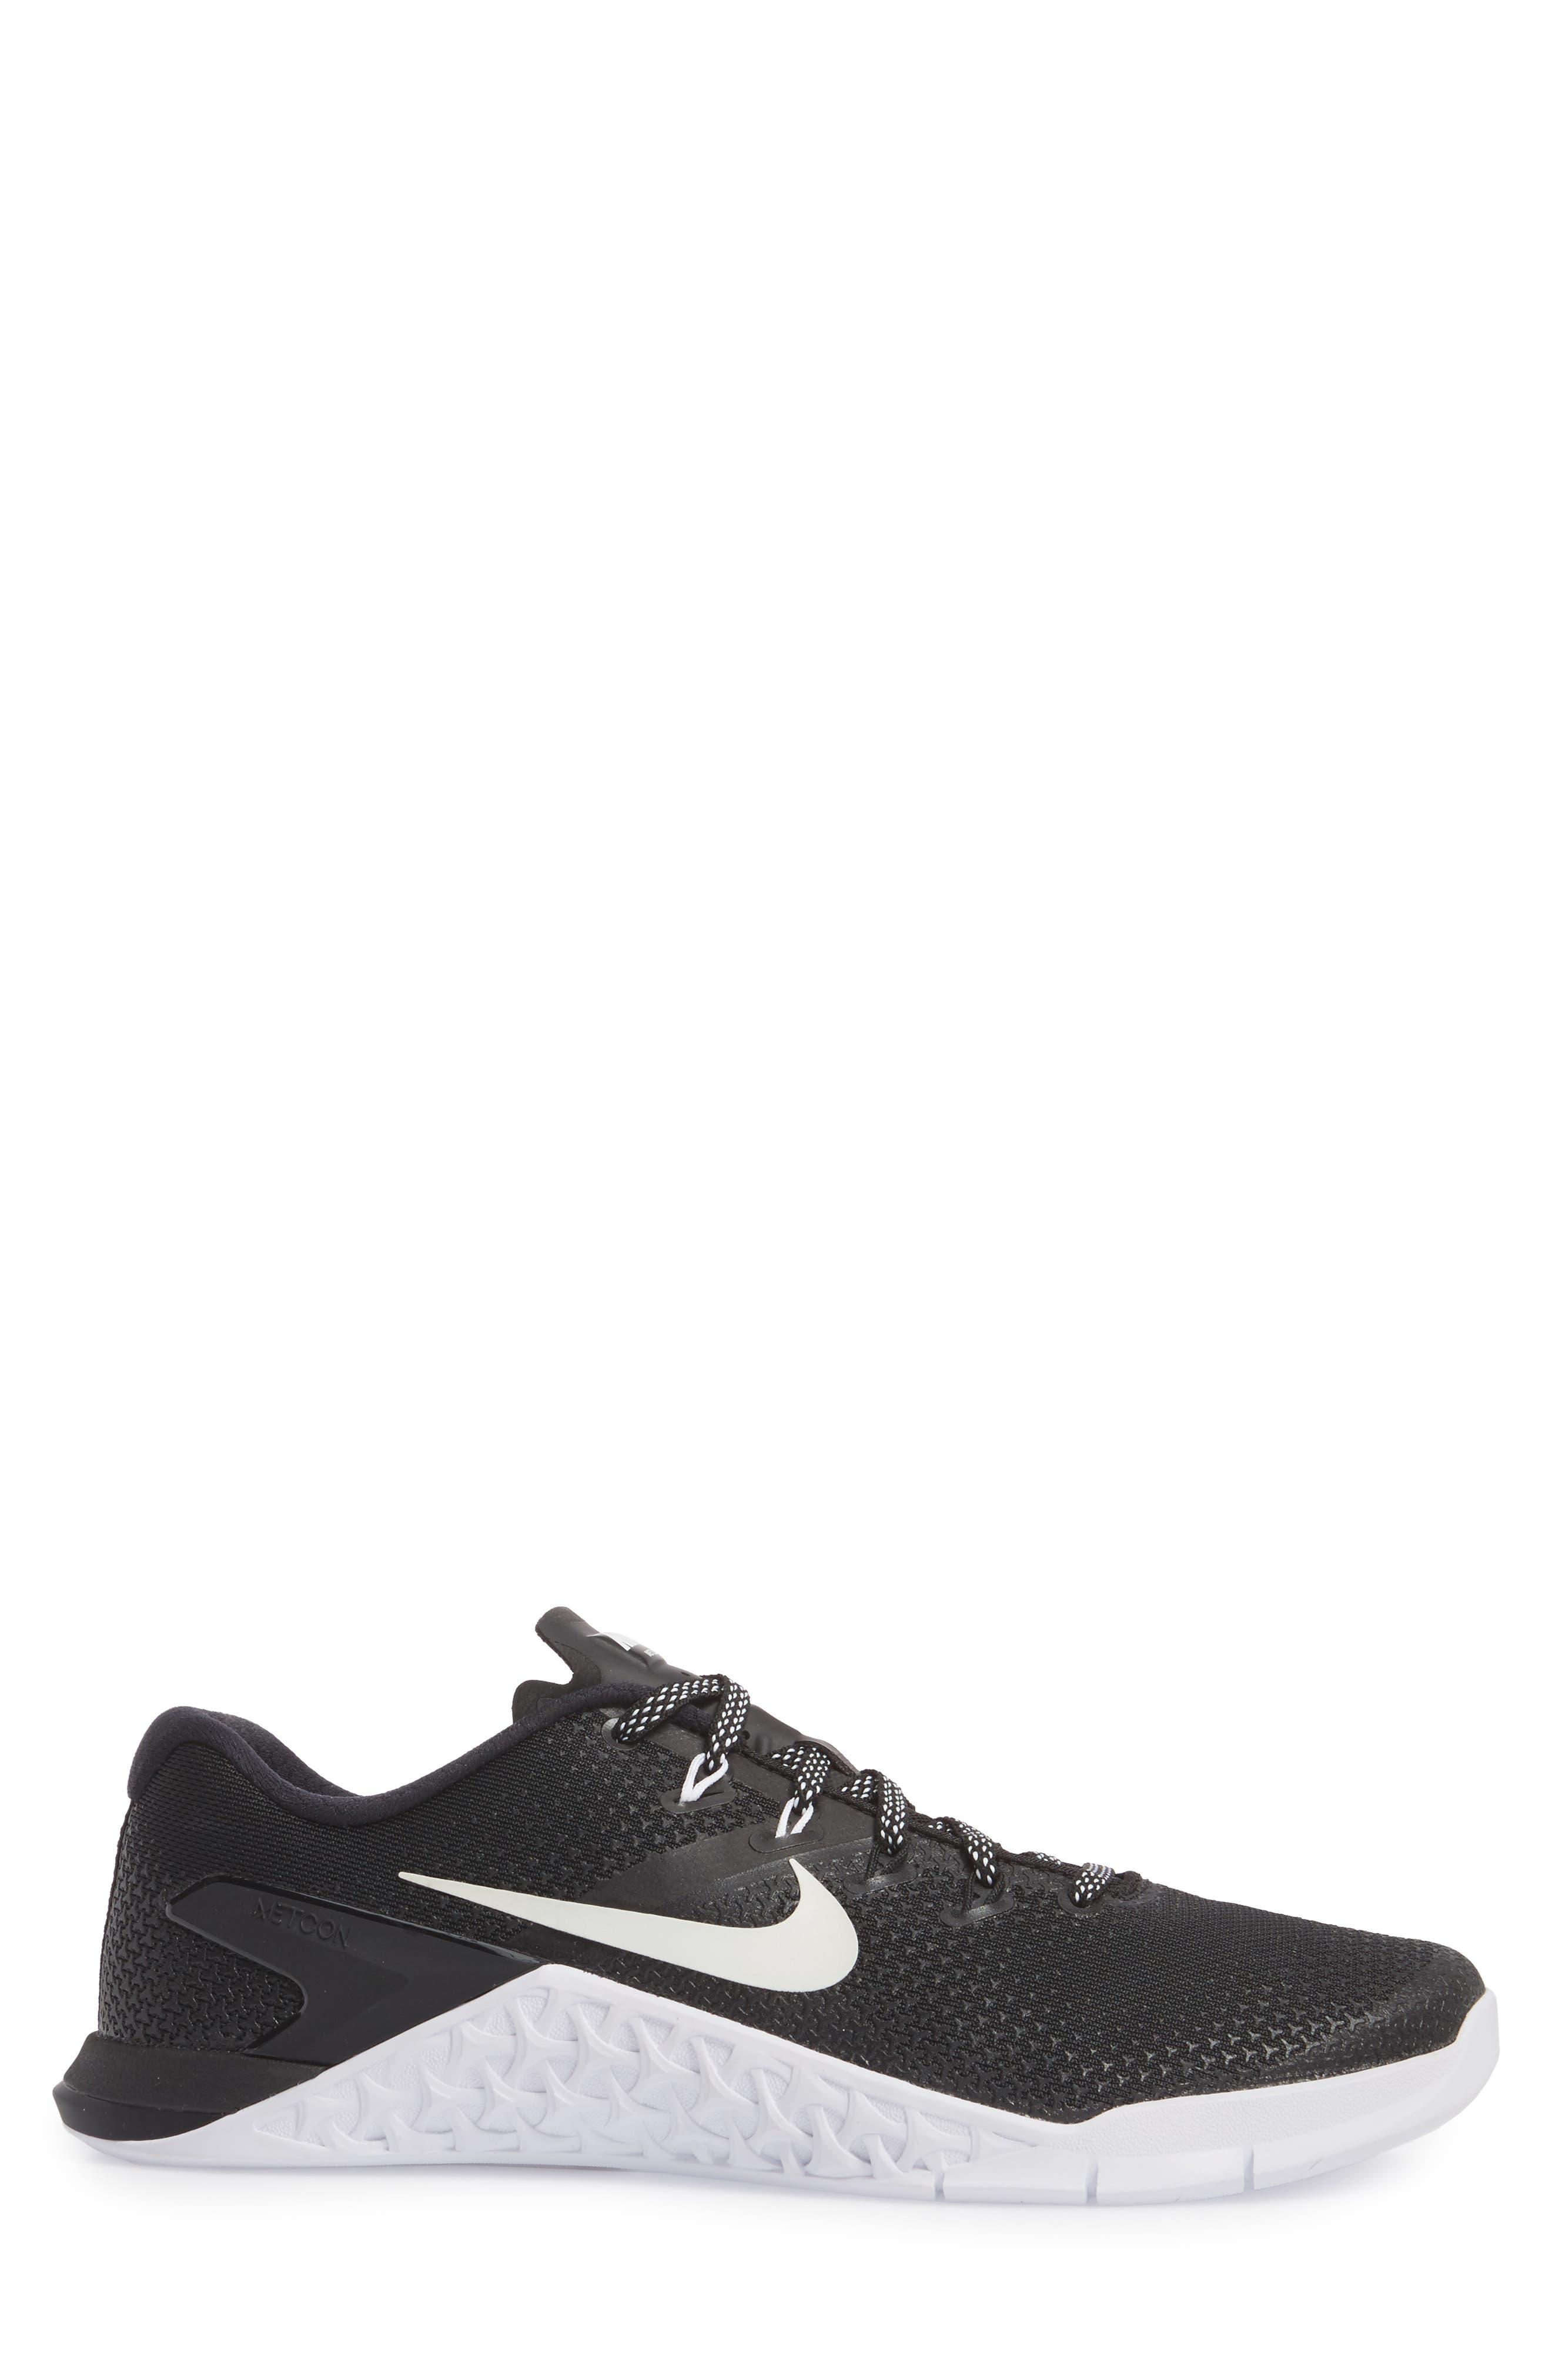 Metcon 4 Training Shoe,                             Alternate thumbnail 40, color,